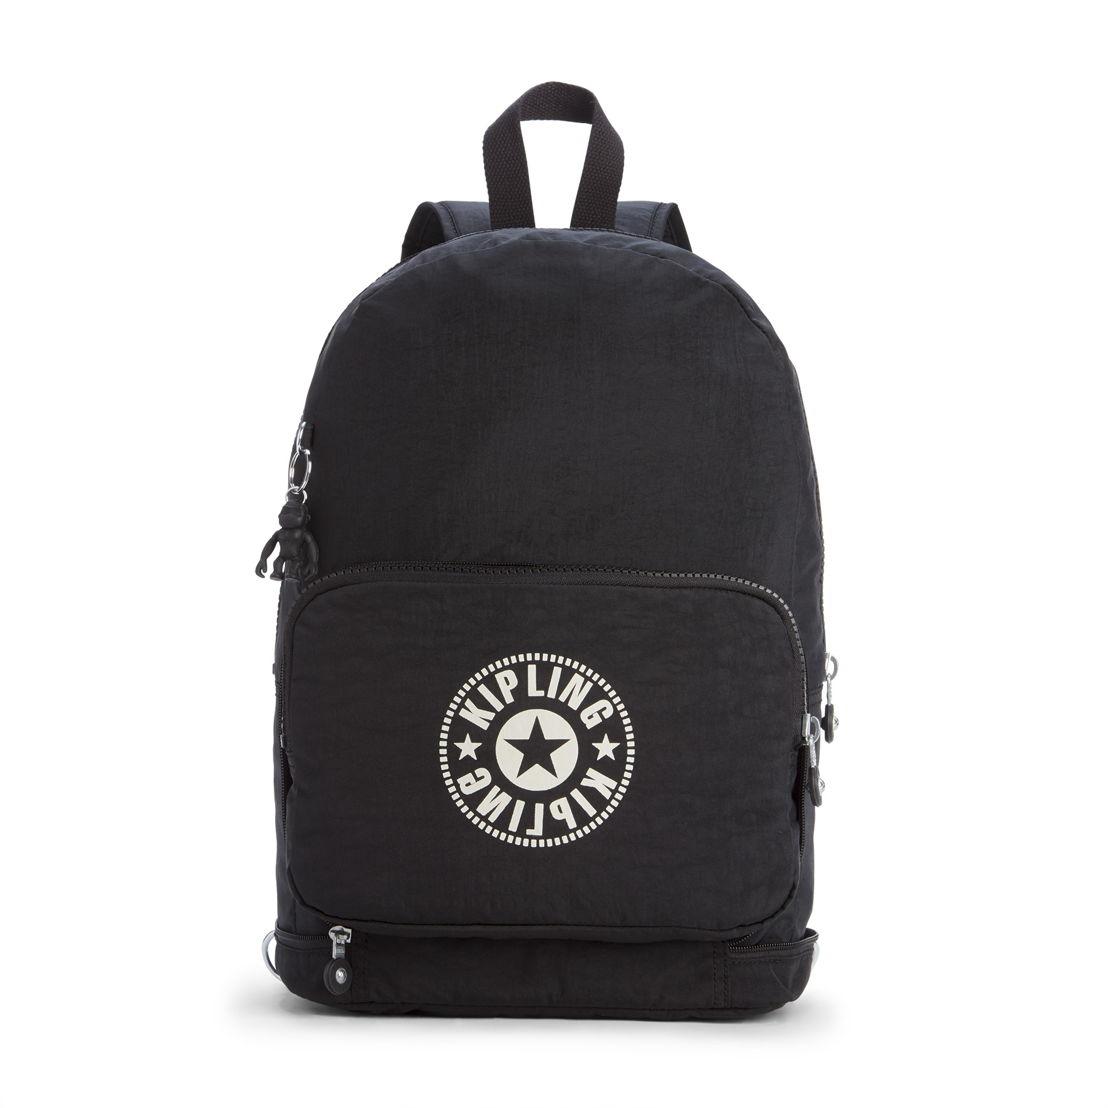 CLASSIC NIMAN FOLD Lively Black - £74 (unfolded - backpack)